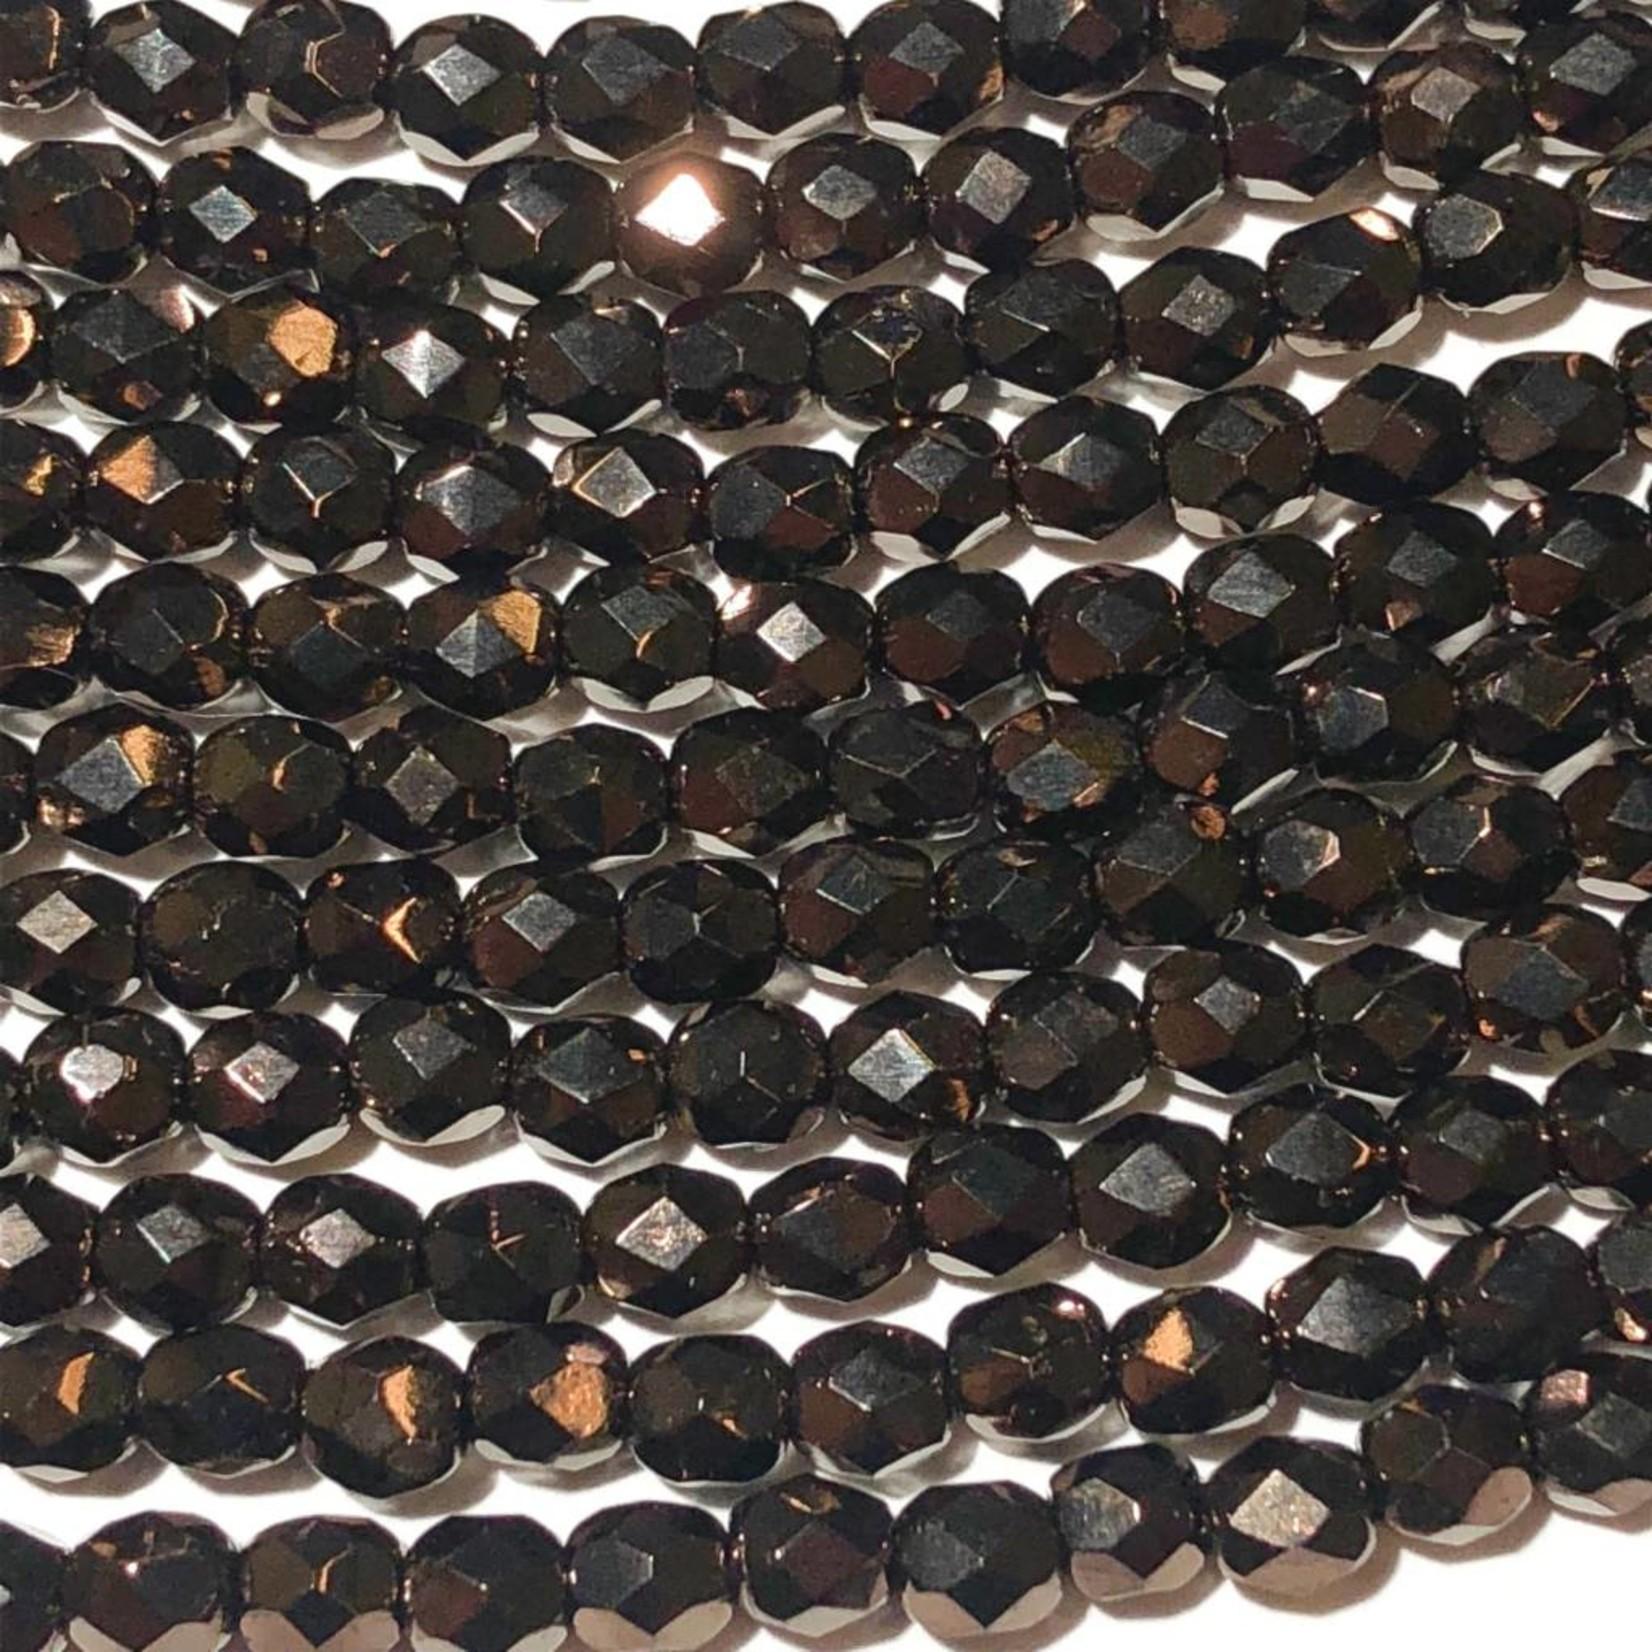 MATUBO Firepolish Chocolate Bronze 4mm